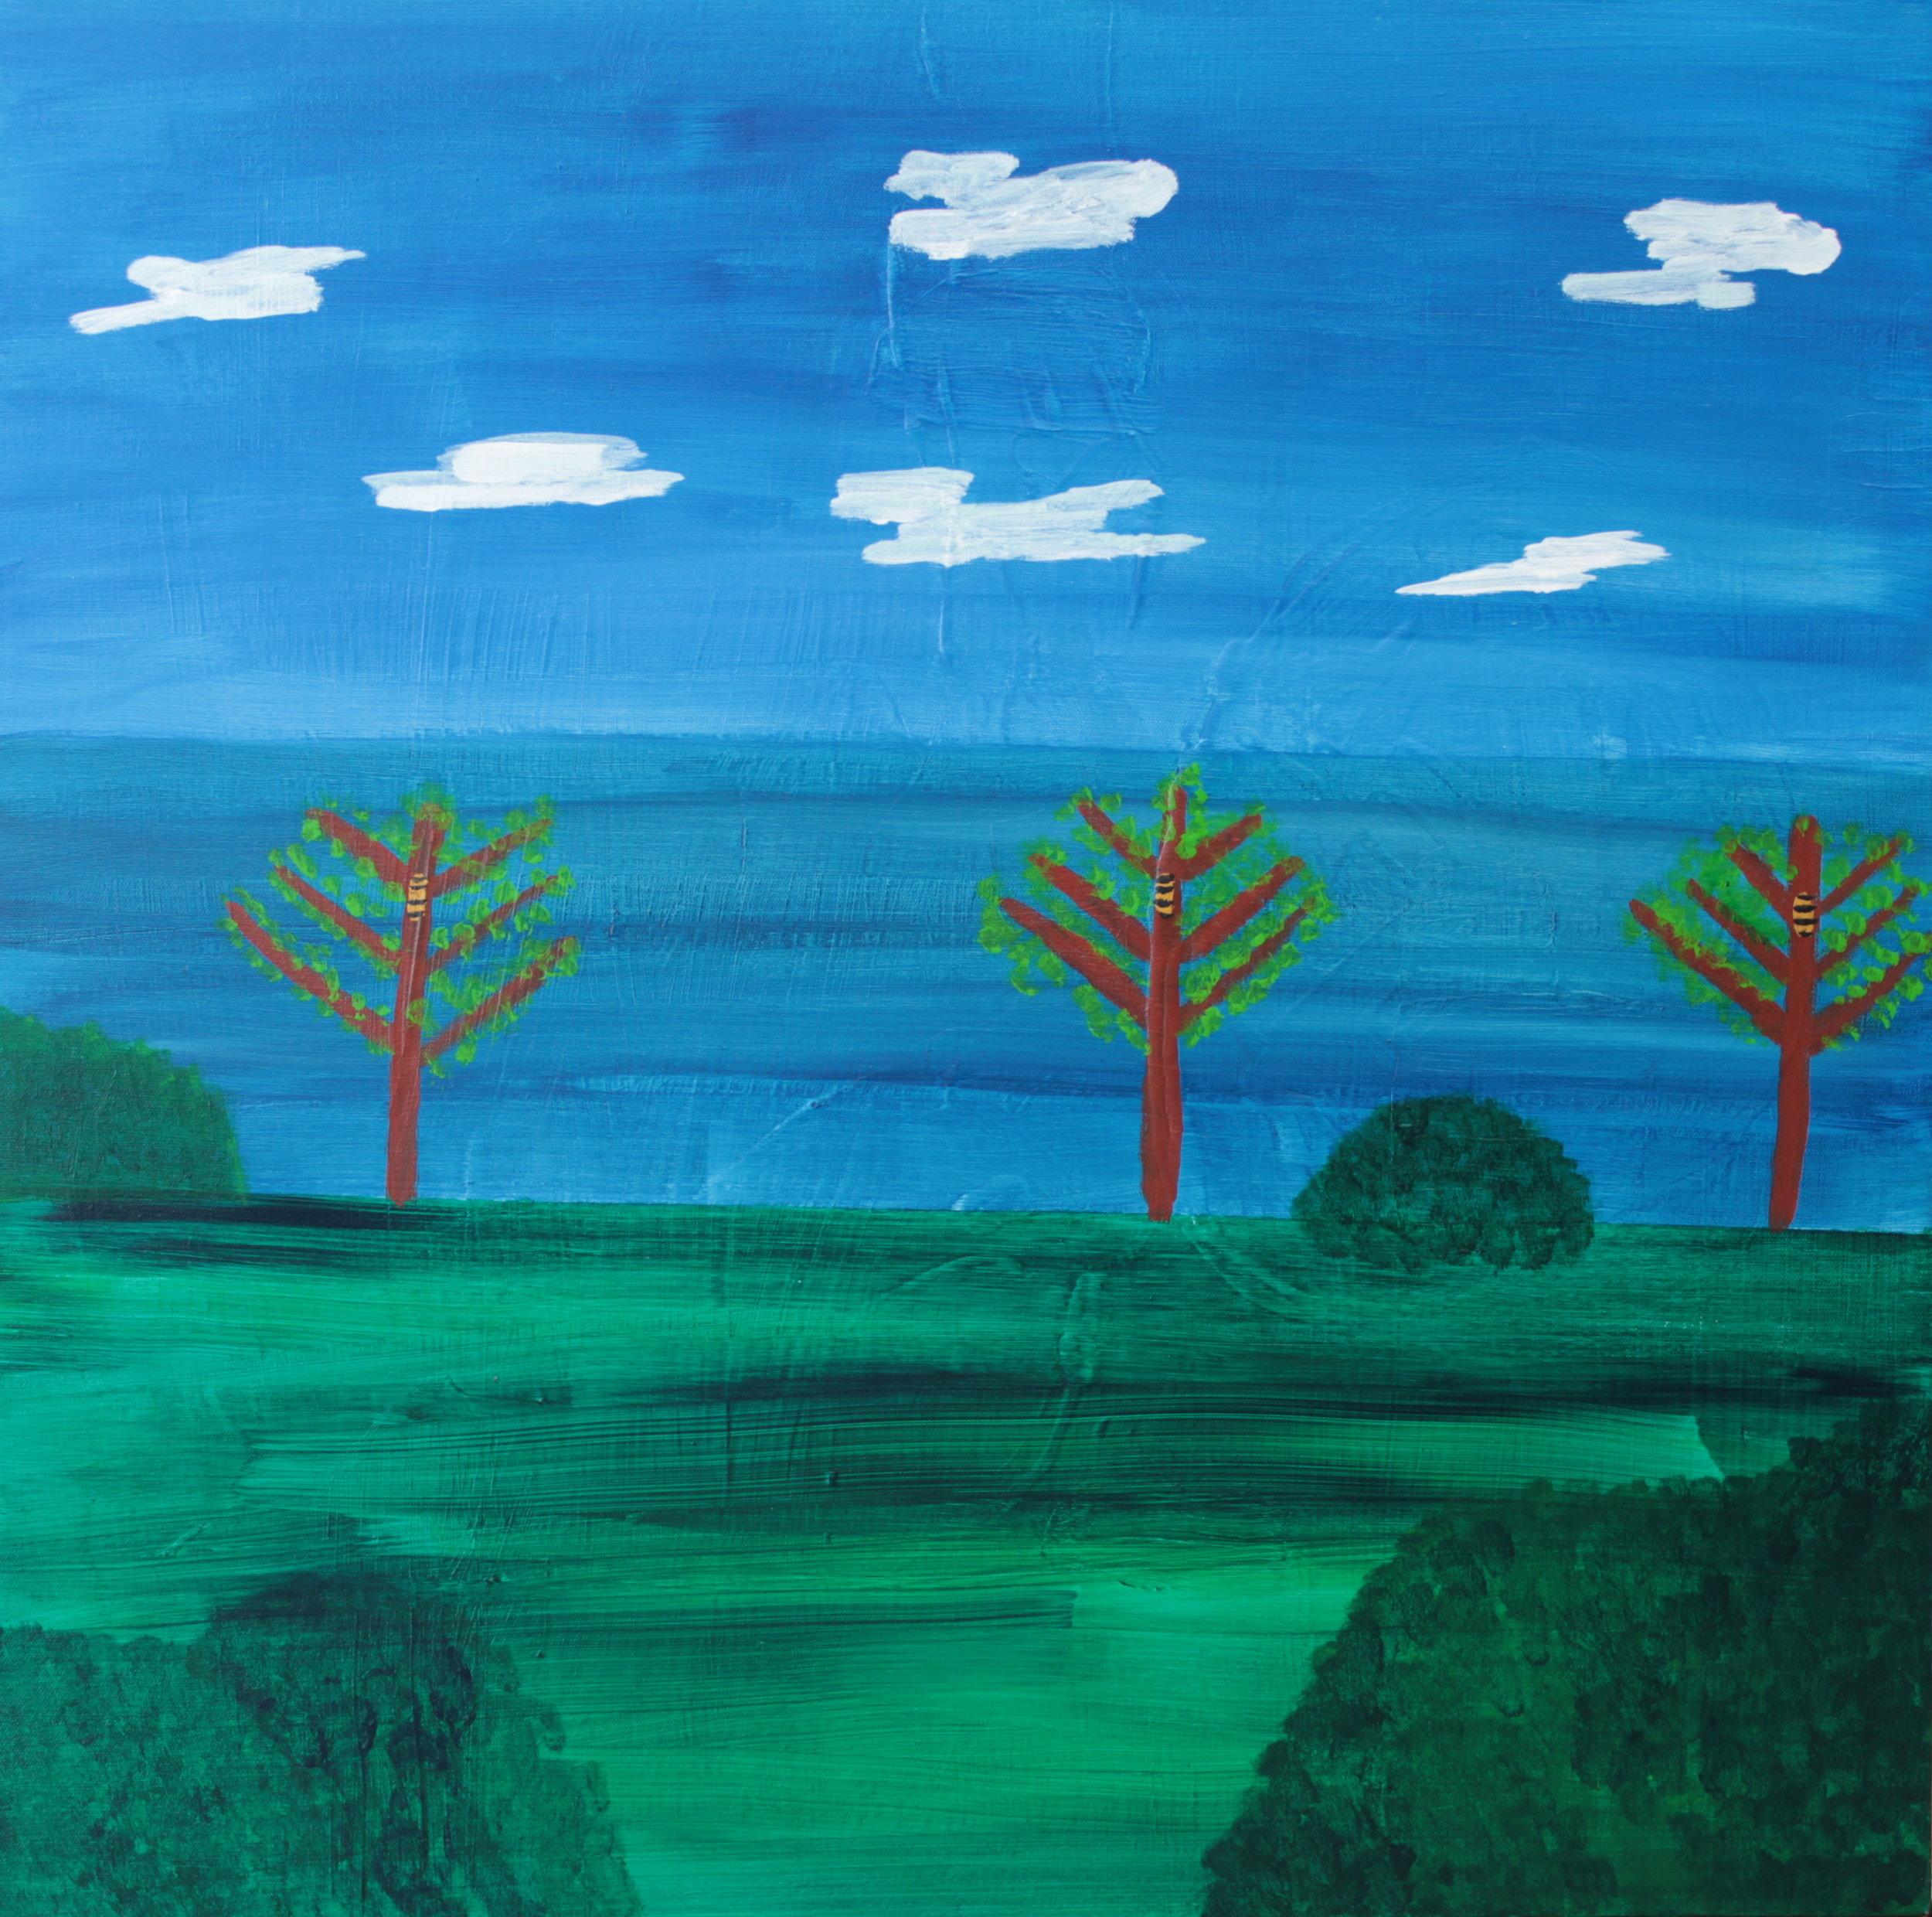 16 2014 Three Beehives Acrylic on Canvas 76 X 76cm Yaniv Janson.JPG